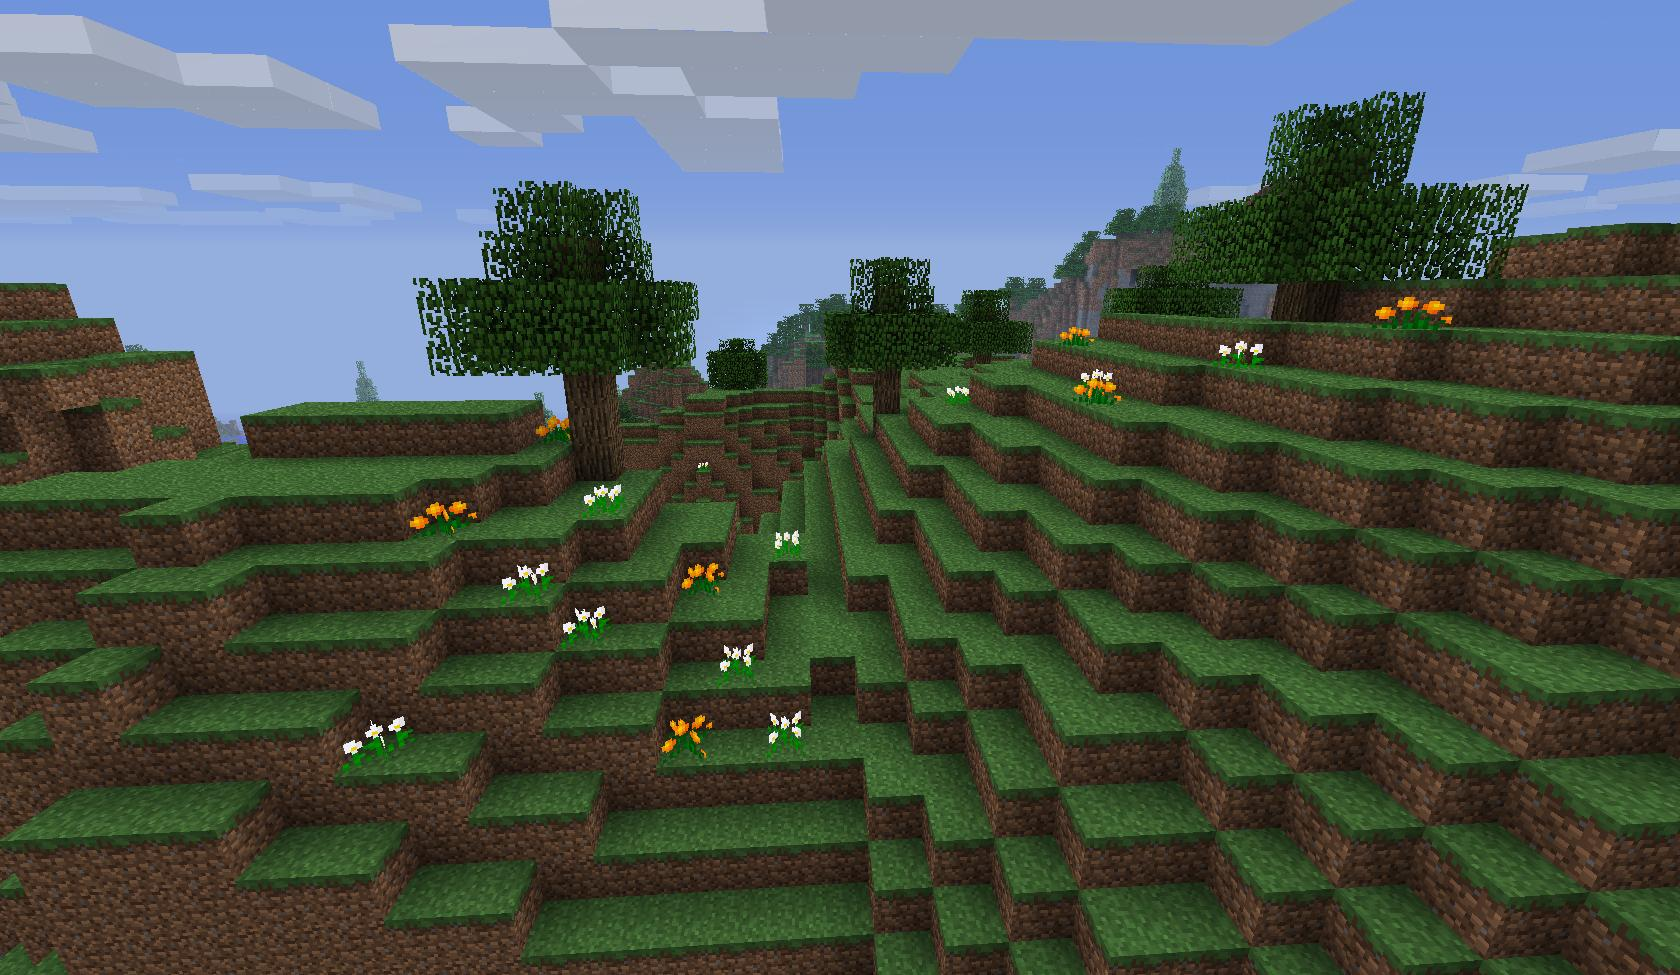 Green Hills biome